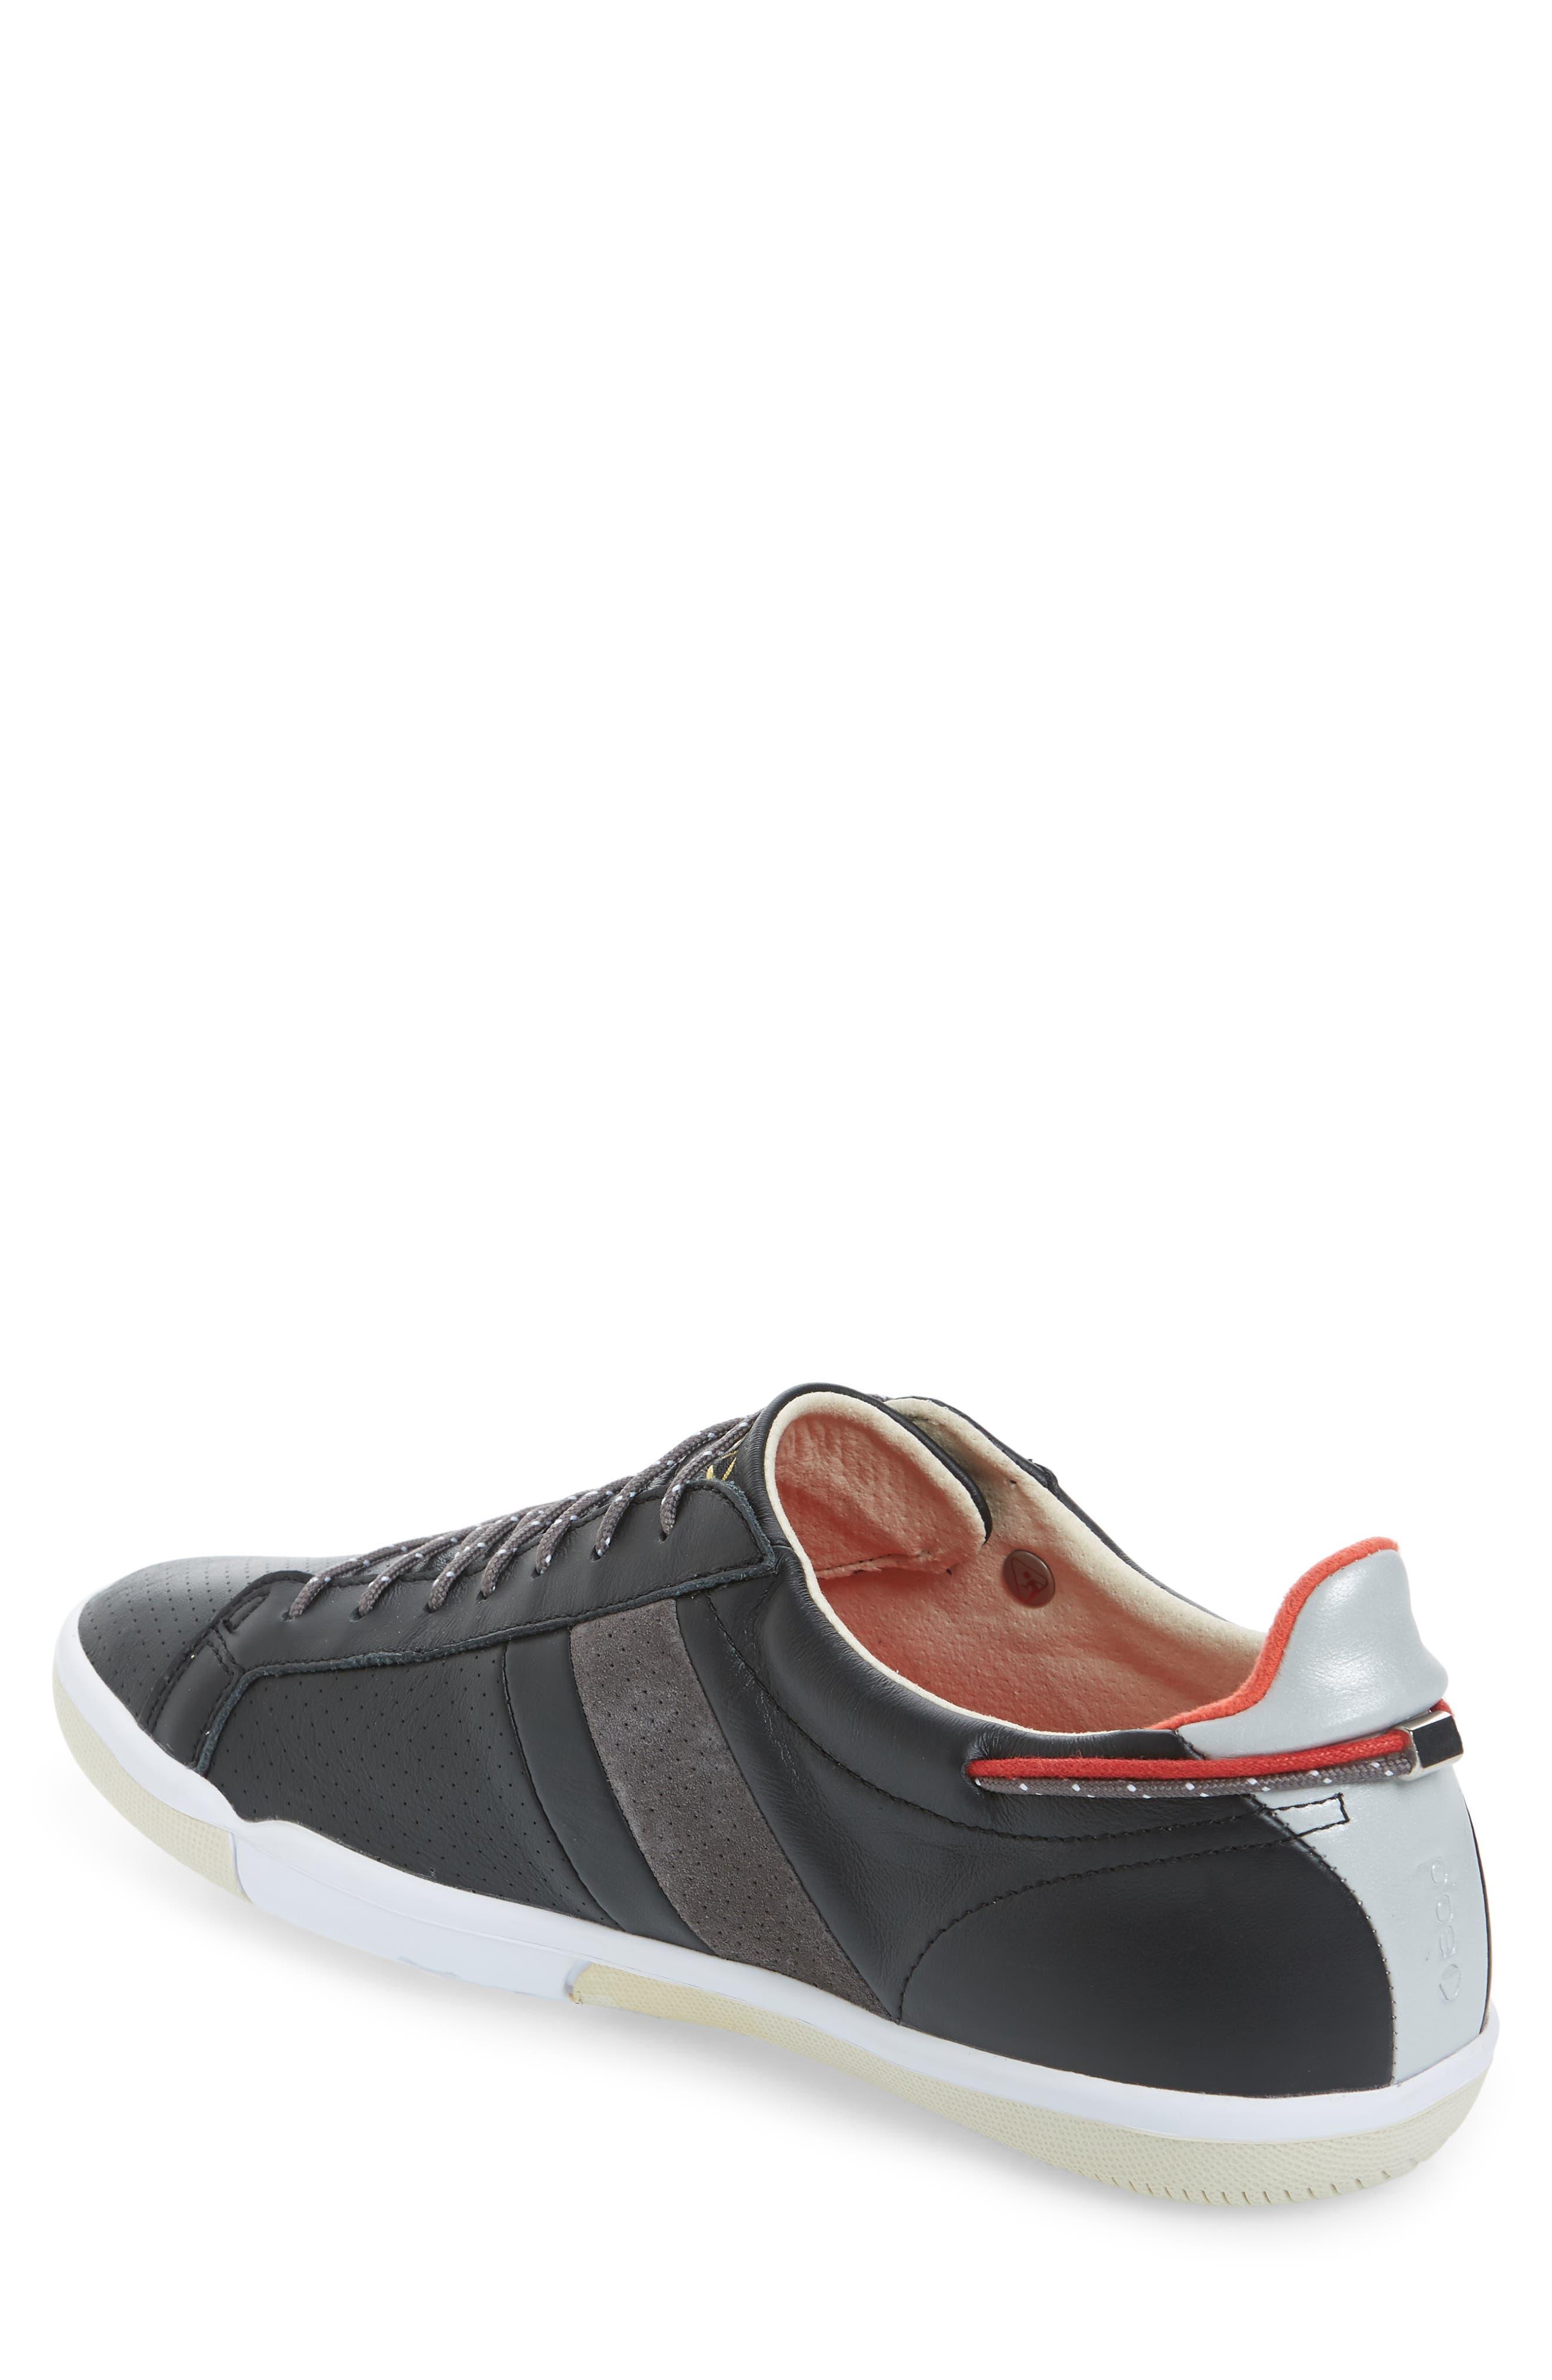 Mulberry Low Top Sneaker,                             Alternate thumbnail 2, color,                             BLACK